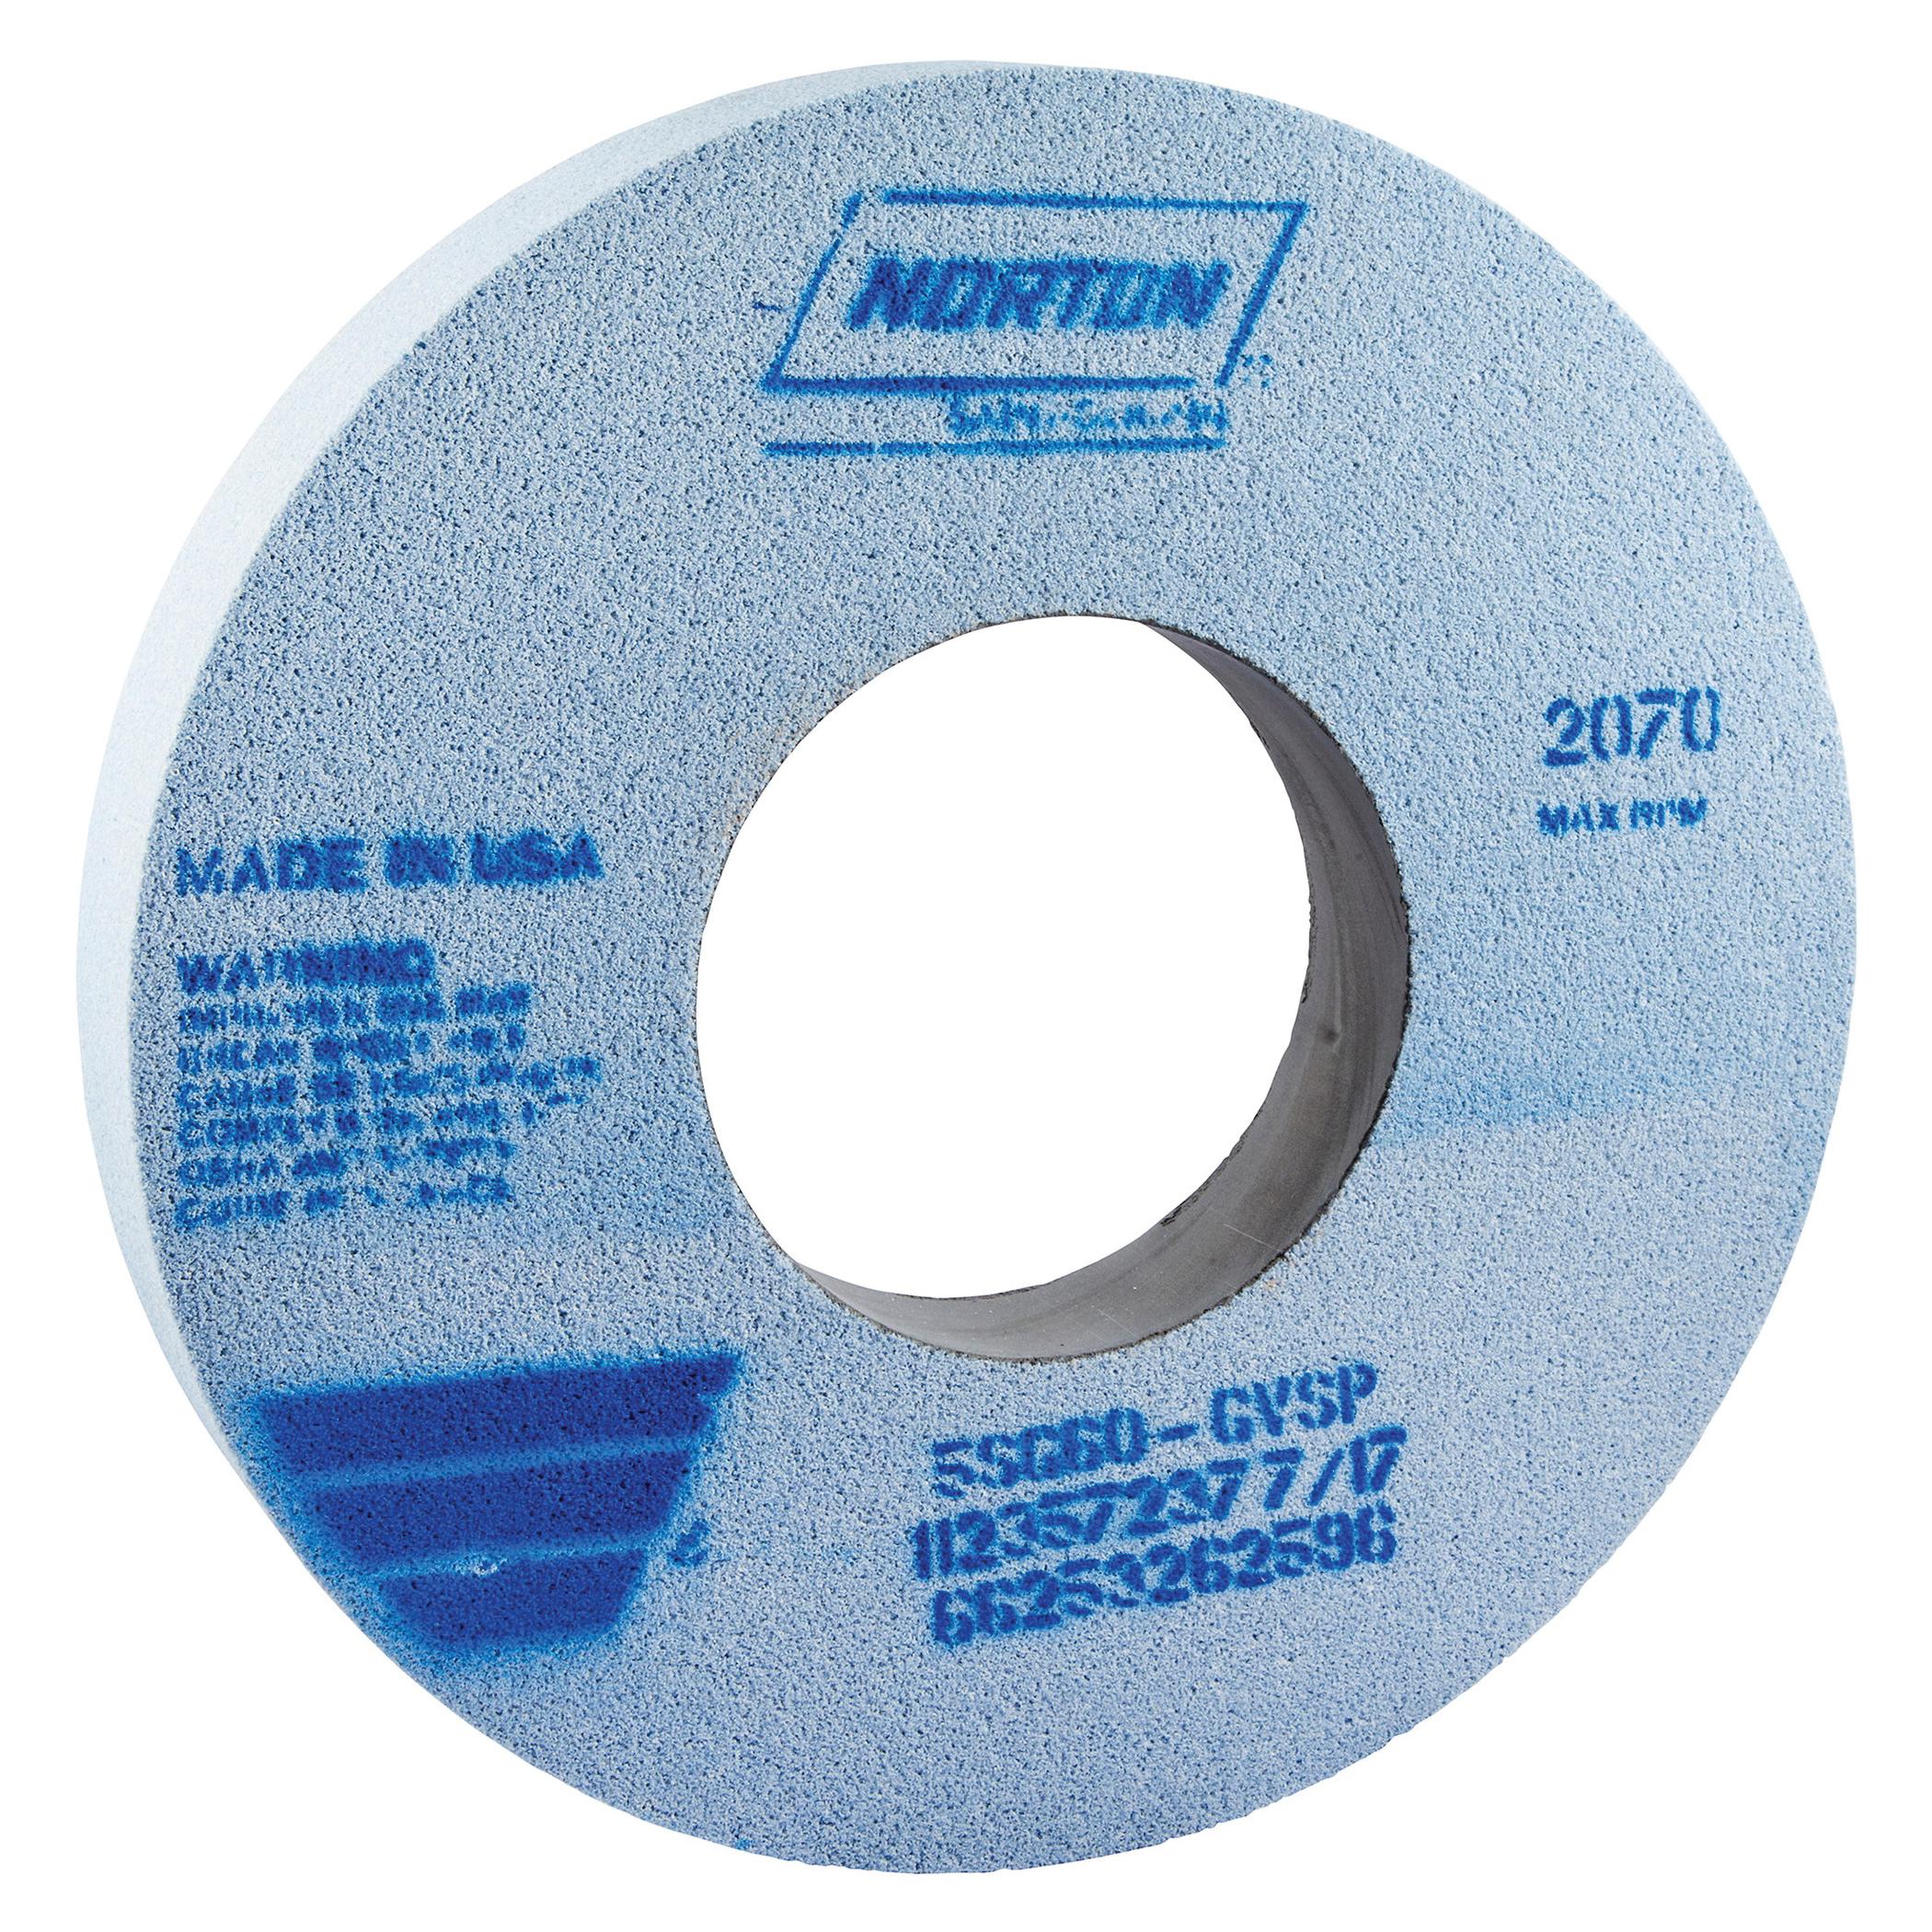 Norton® 66253262596 5SG Straight Toolroom Wheel, 12 in Dia x 1-1/2 in THK, 5 in Center Hole, 60 Grit, Ceramic Alumina/Friable Aluminum Oxide Abrasive